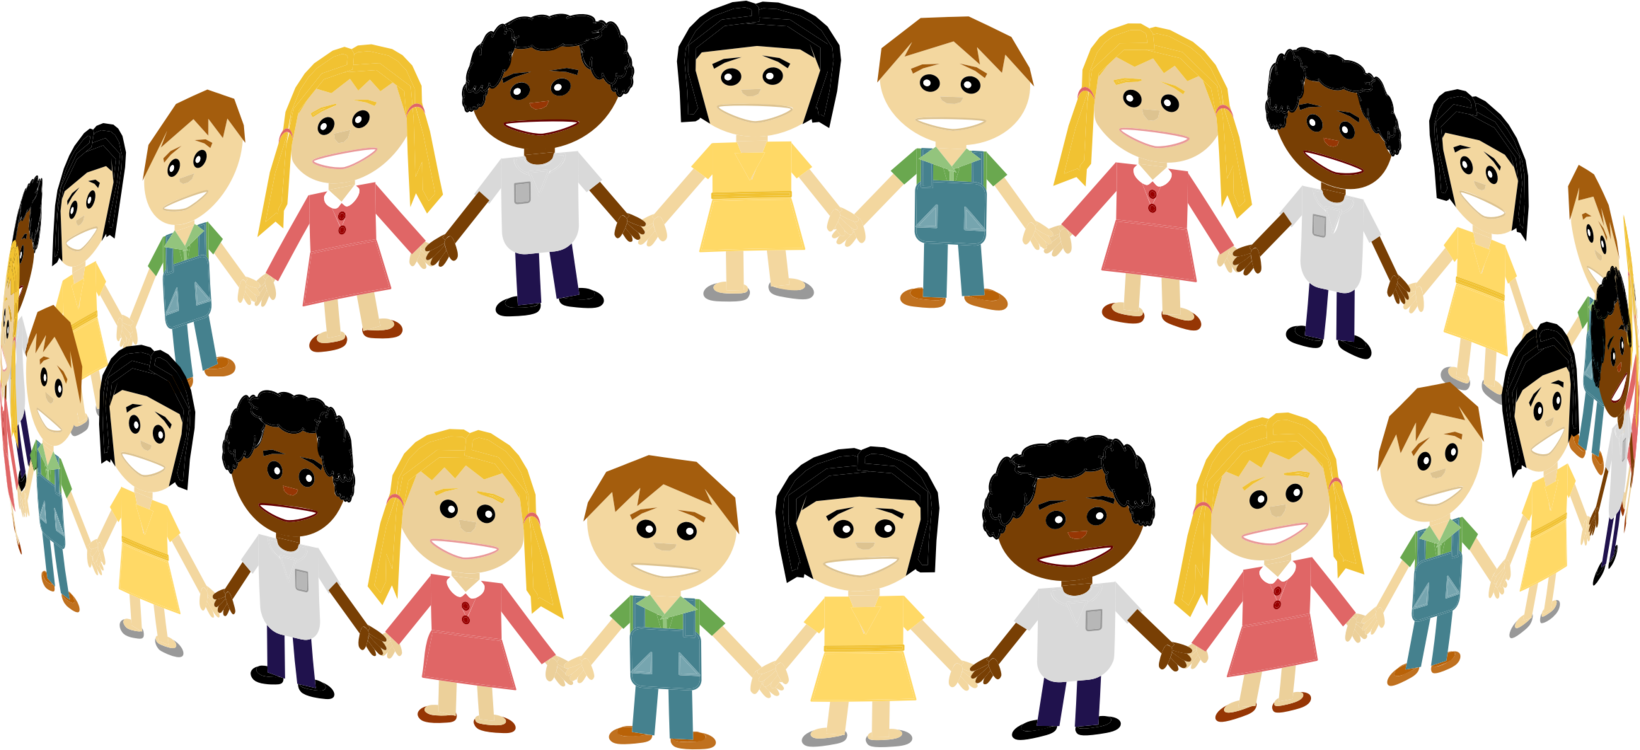 Human Behavior,Organization,People